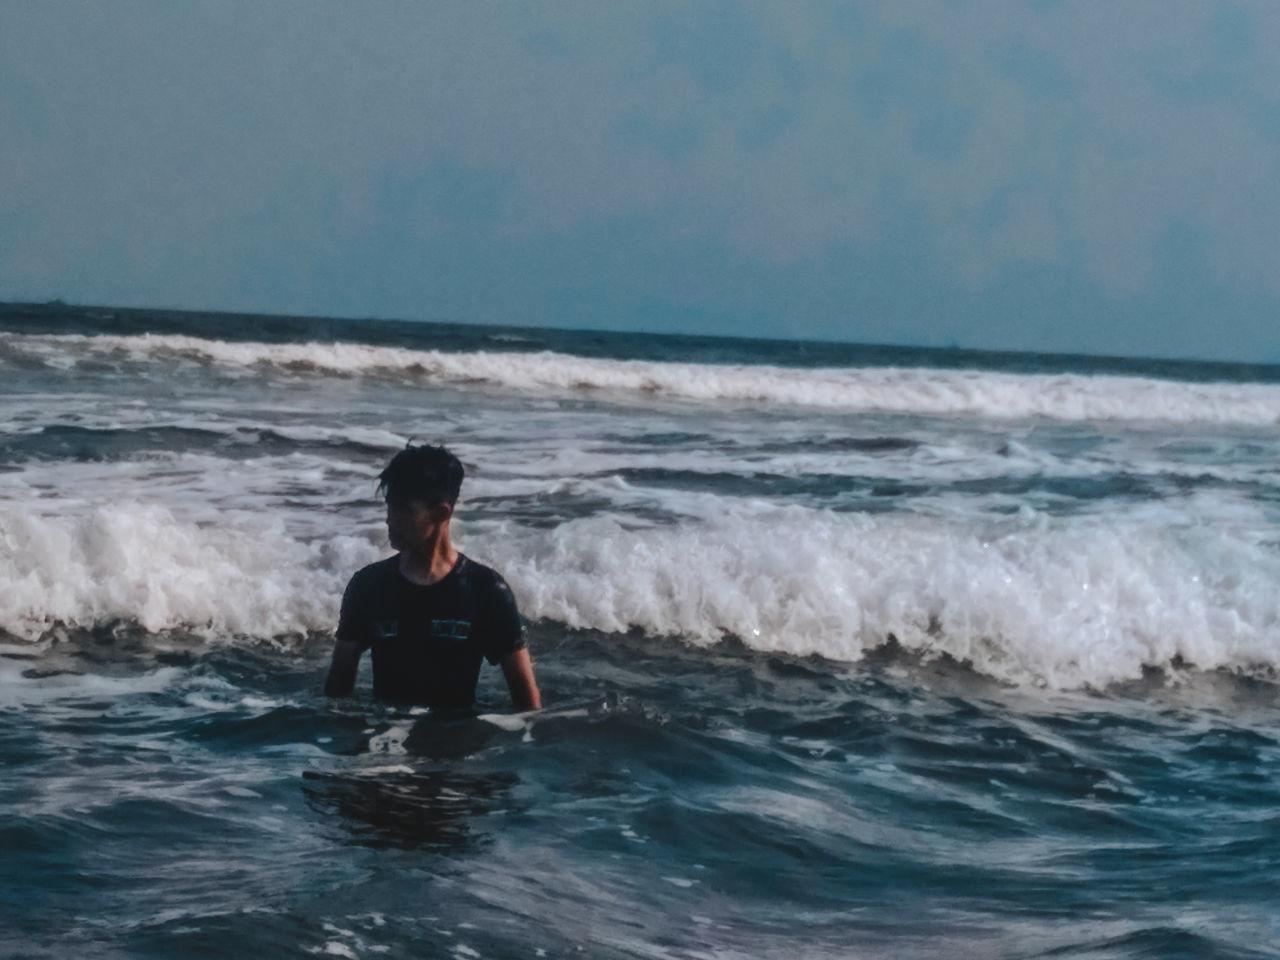 FULL LENGTH OF MAN AT SEA SHORE AGAINST SKY